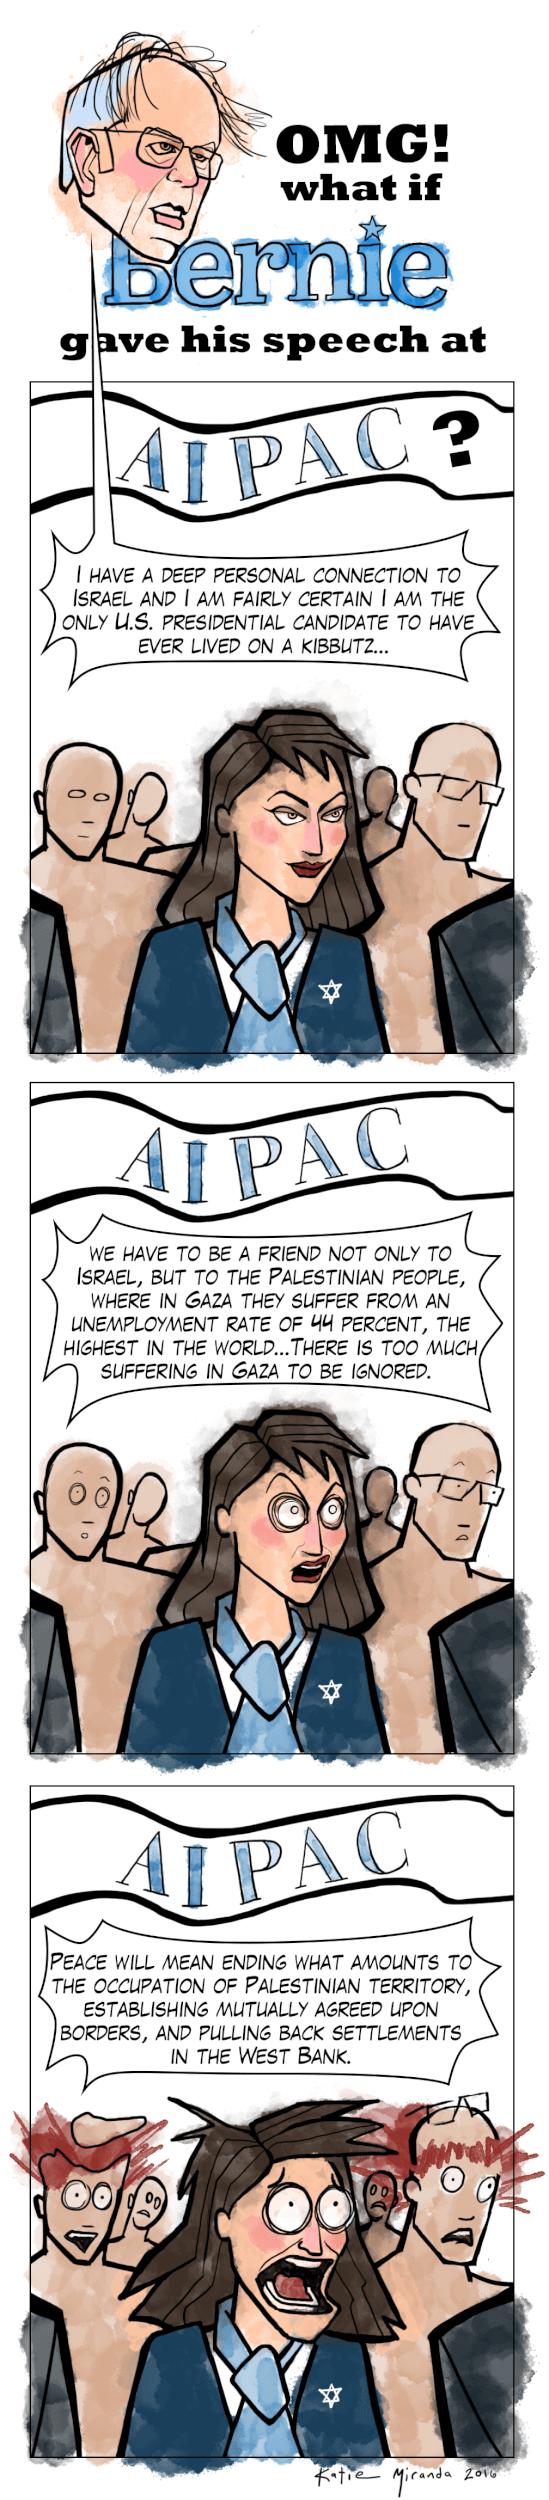 What if Bernie Sanders had actually spoken at AIPAC, by Katie Miranda